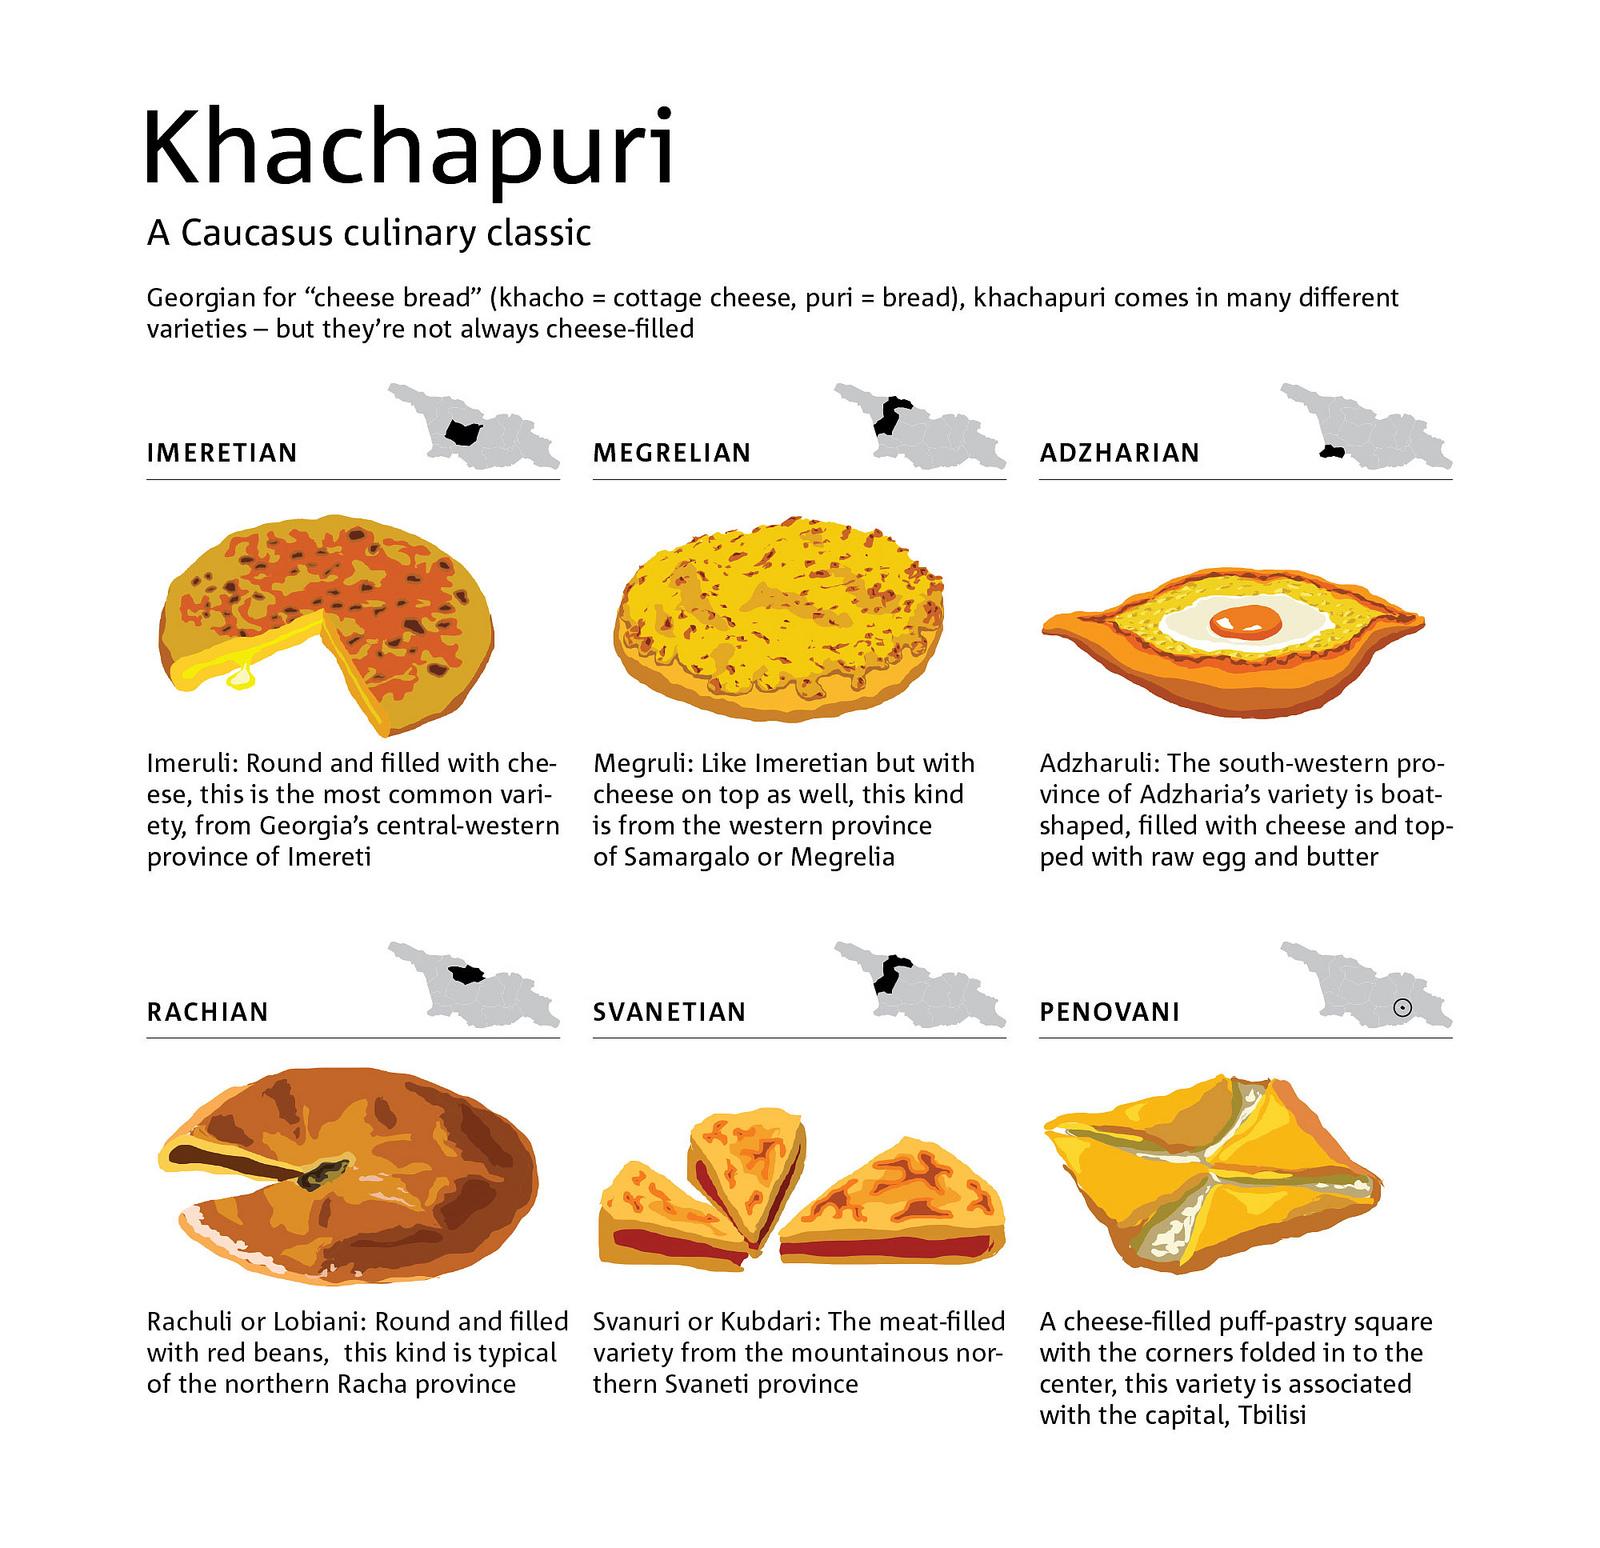 Varieties of khachapuri